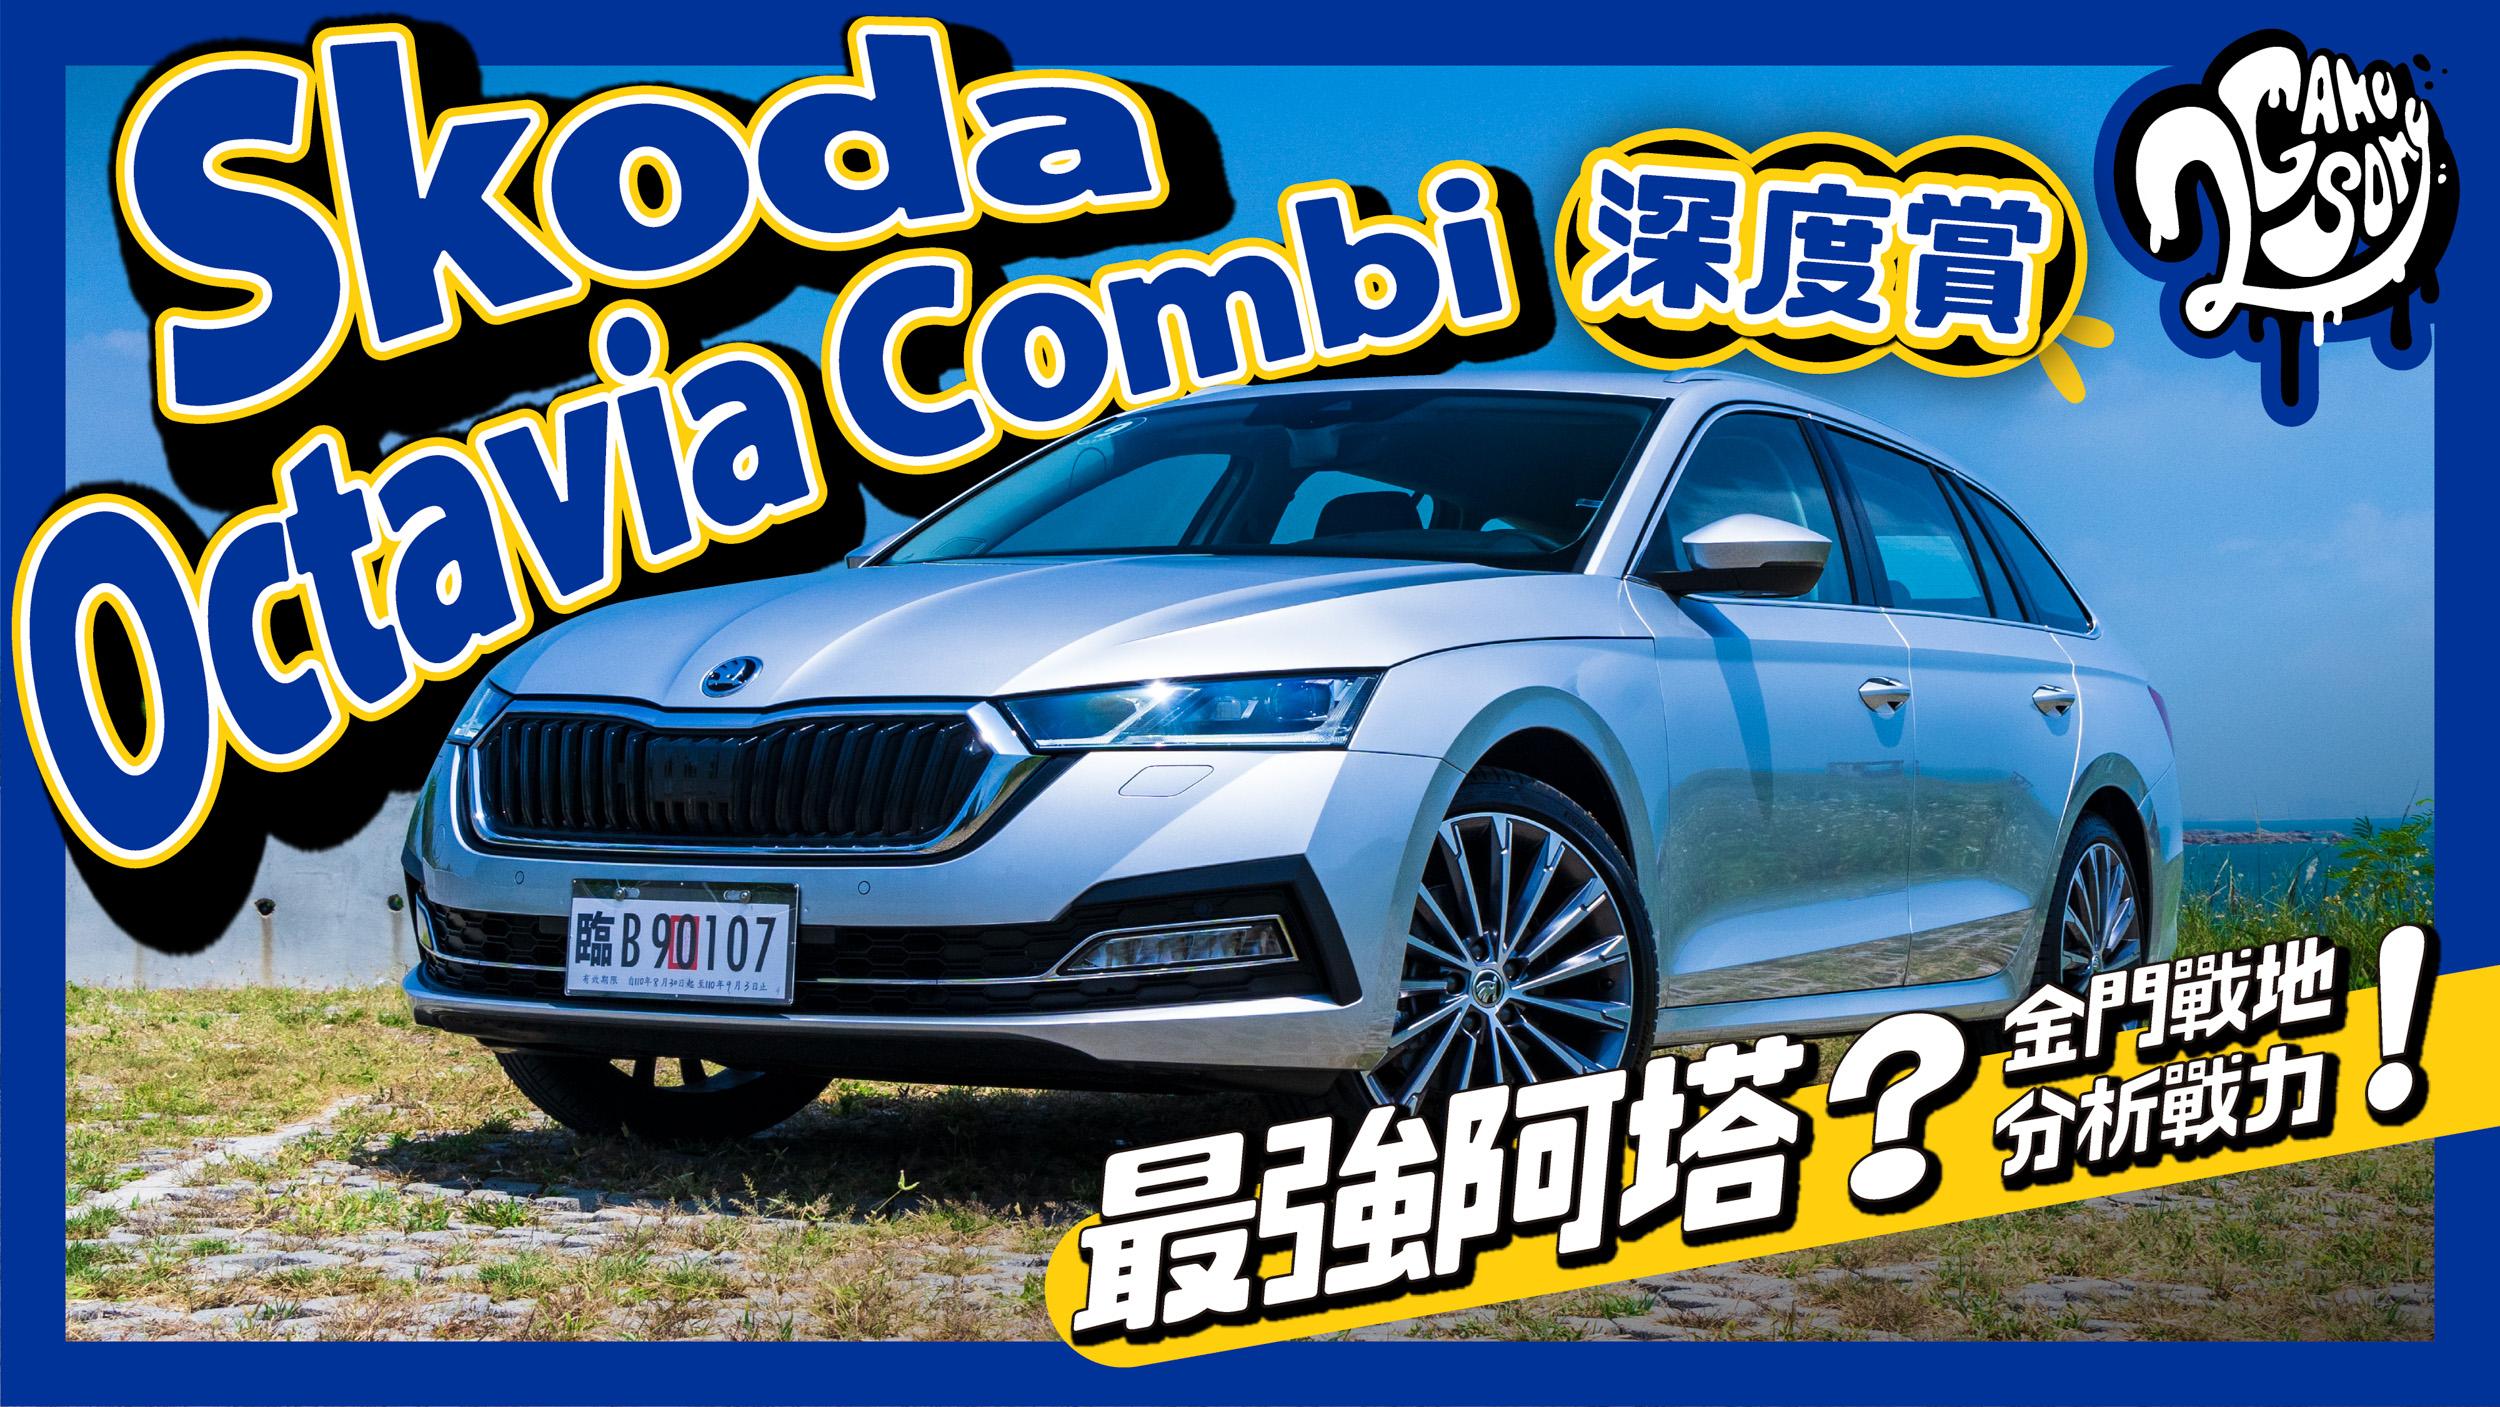 Skoda Octavia Combi 深度賞|最強阿塔?金門戰地分析戰力!